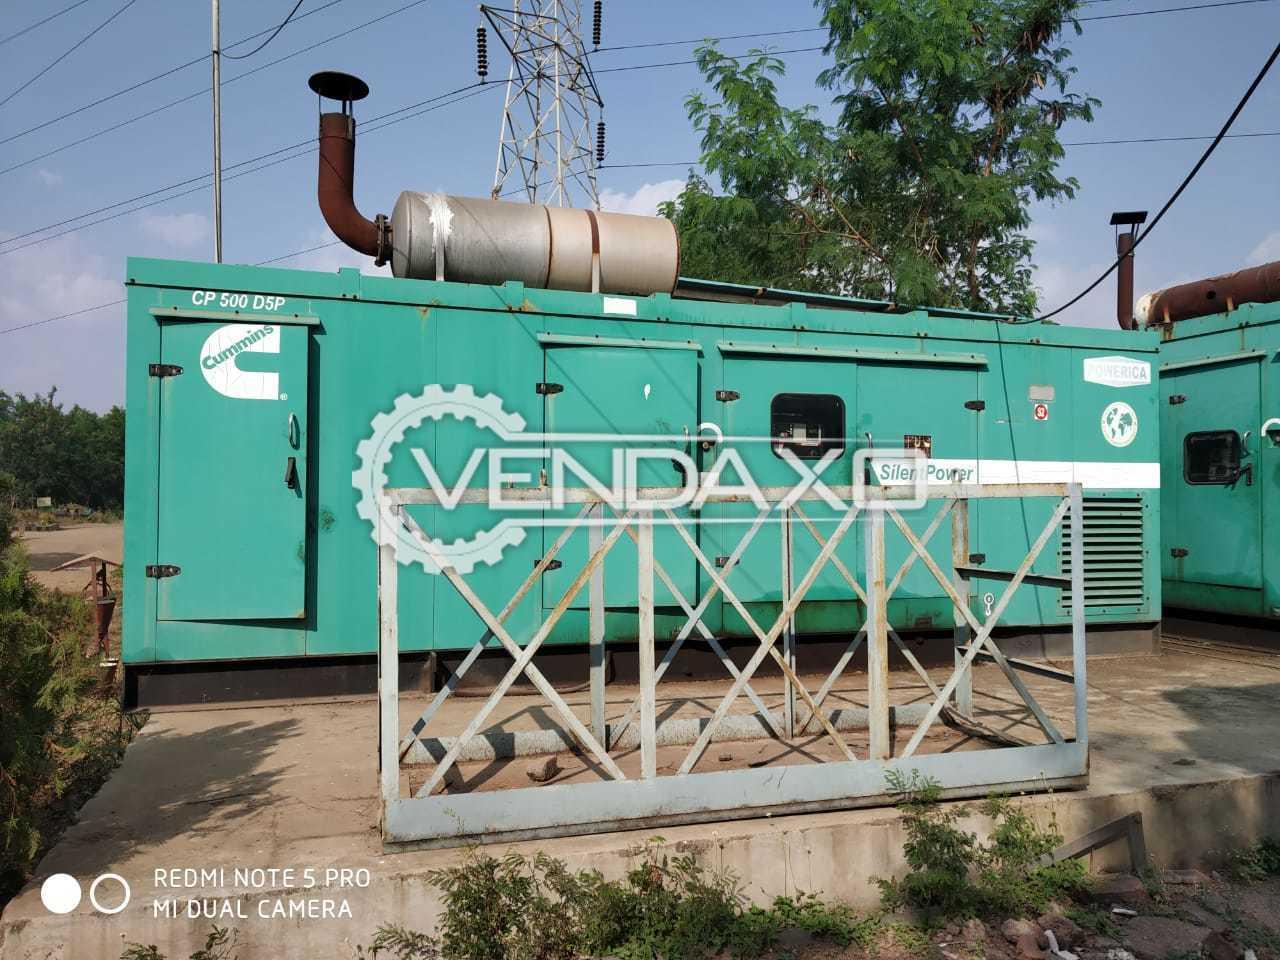 2 Set OF Cummins CP500D5P Diesel Generator - 500 Kva